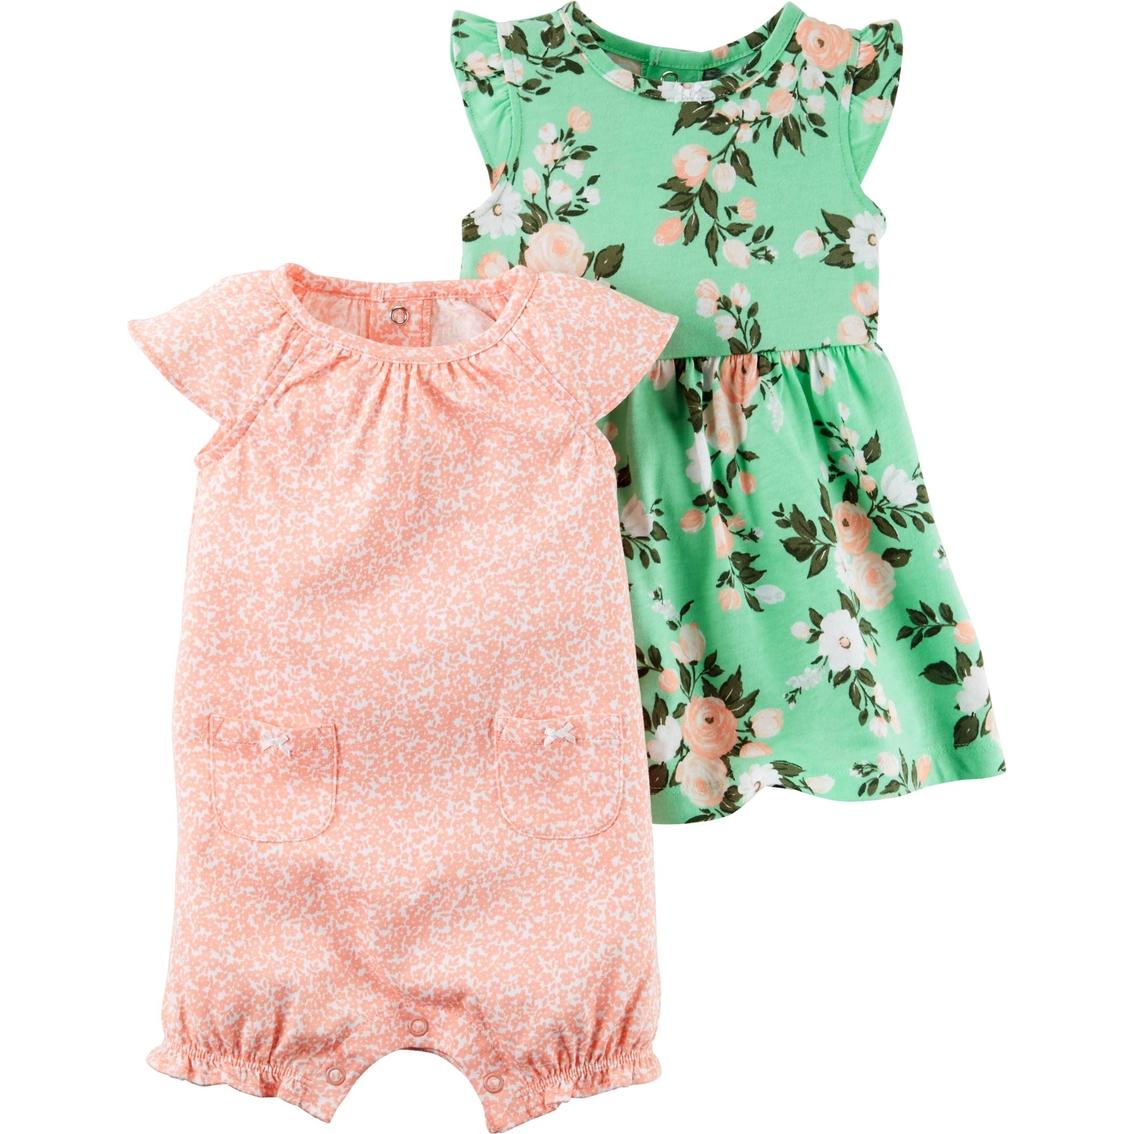 09511df1123e Carter s Infant Girls Floral Dress   Romper Set 2 Pk.